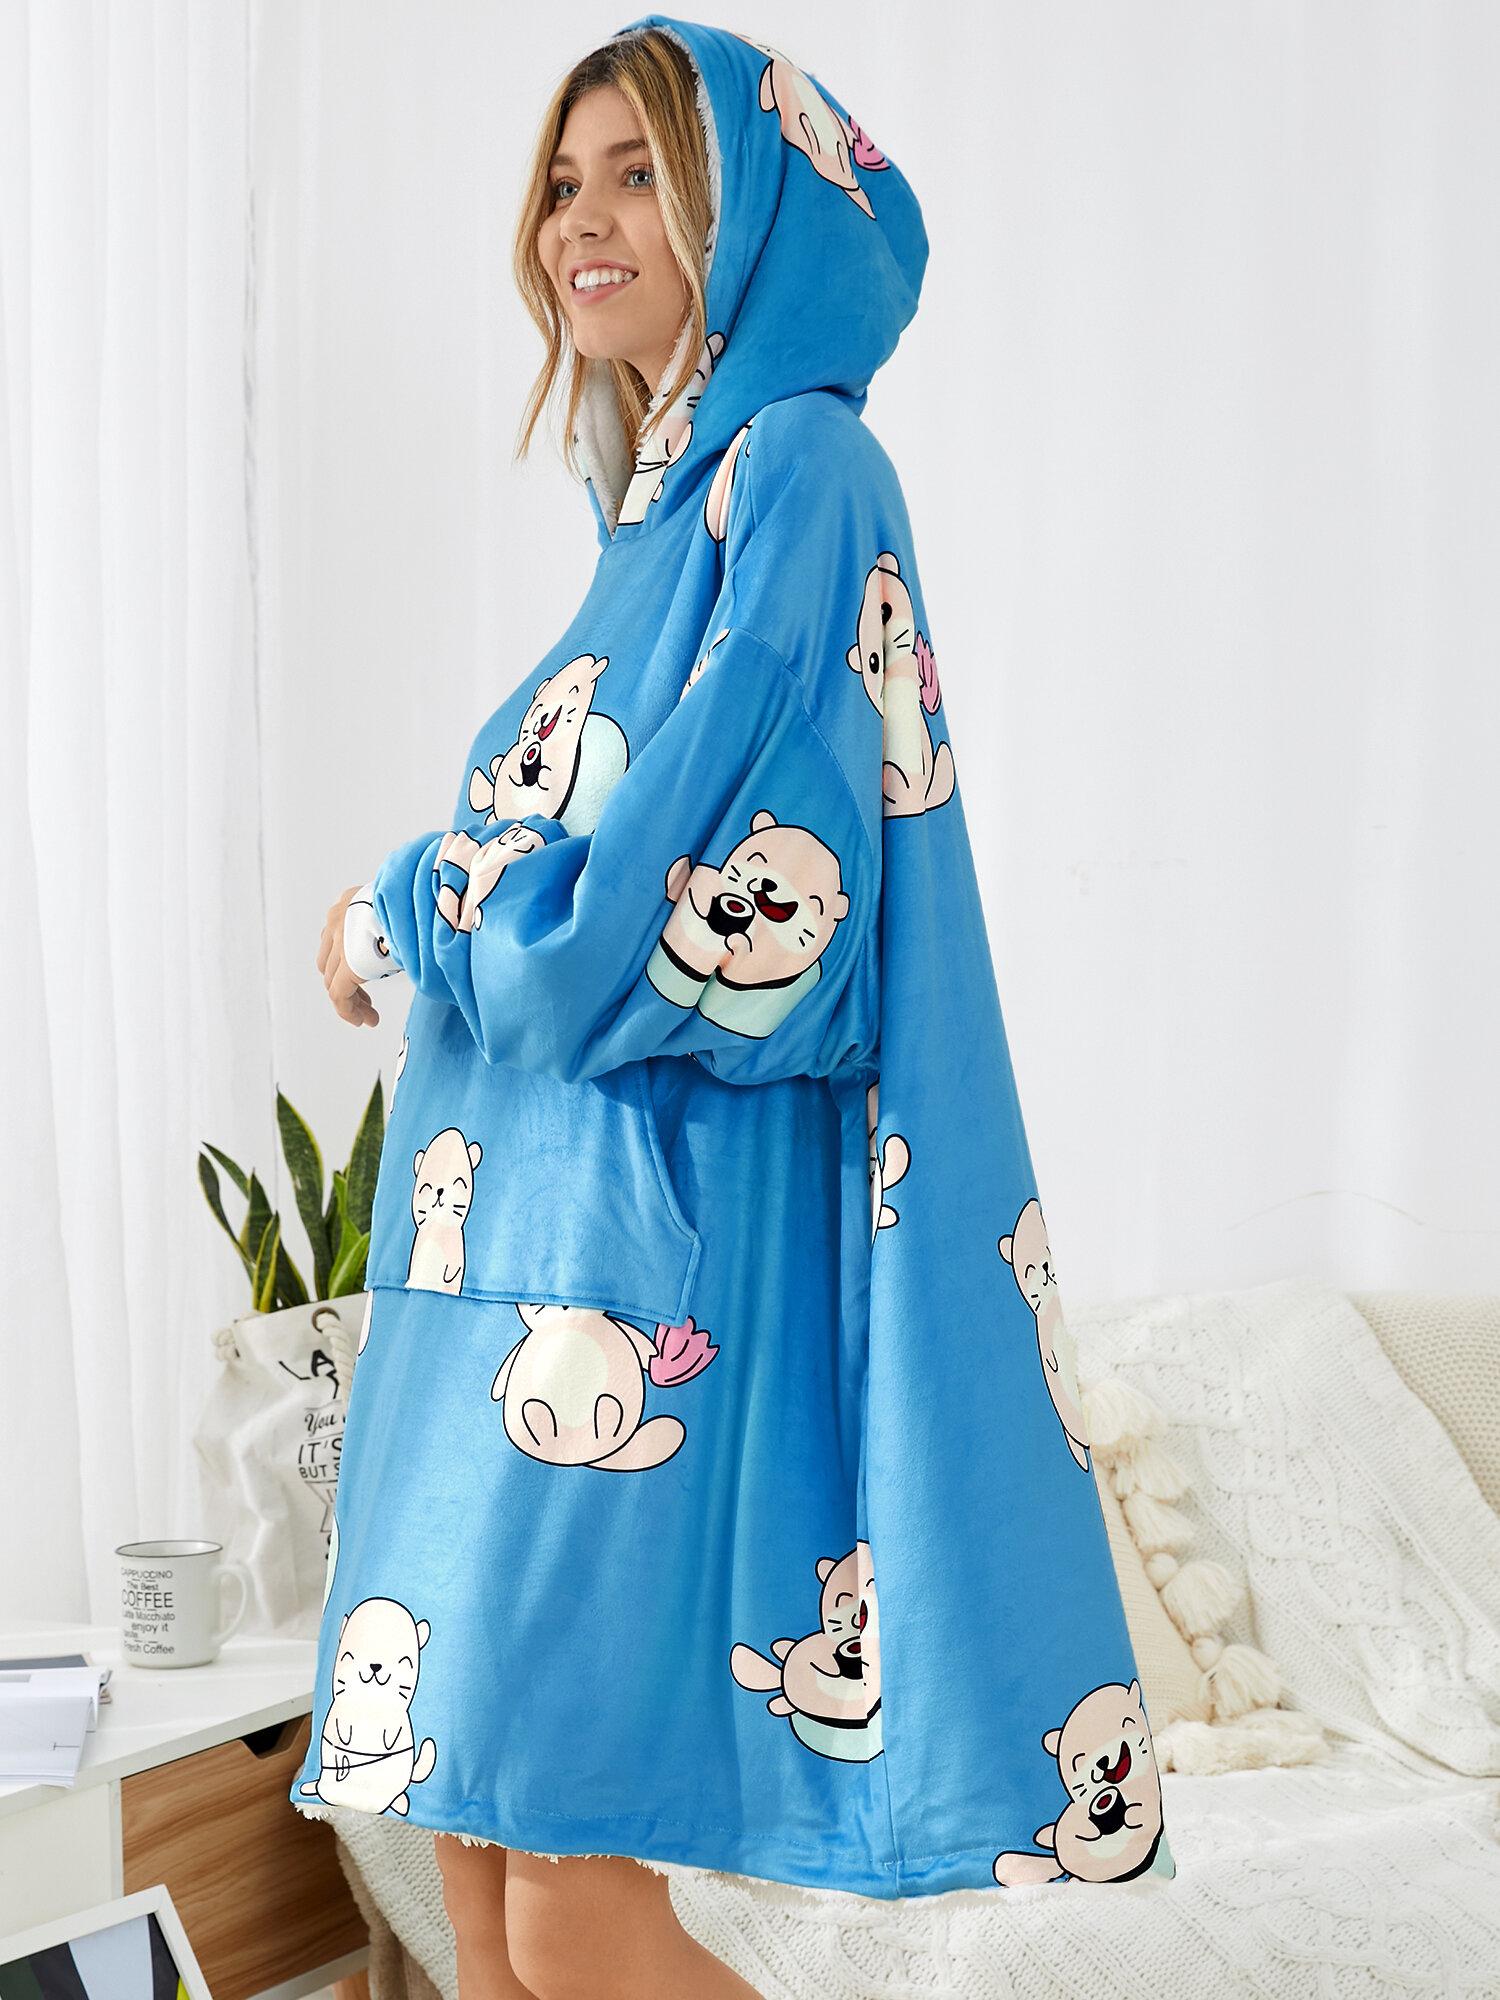 Women Thicken Cartoon Seal Print Fleece Lined Warm Two-Sided Oversized Blanket Hoodie With Kangaroo Pocket